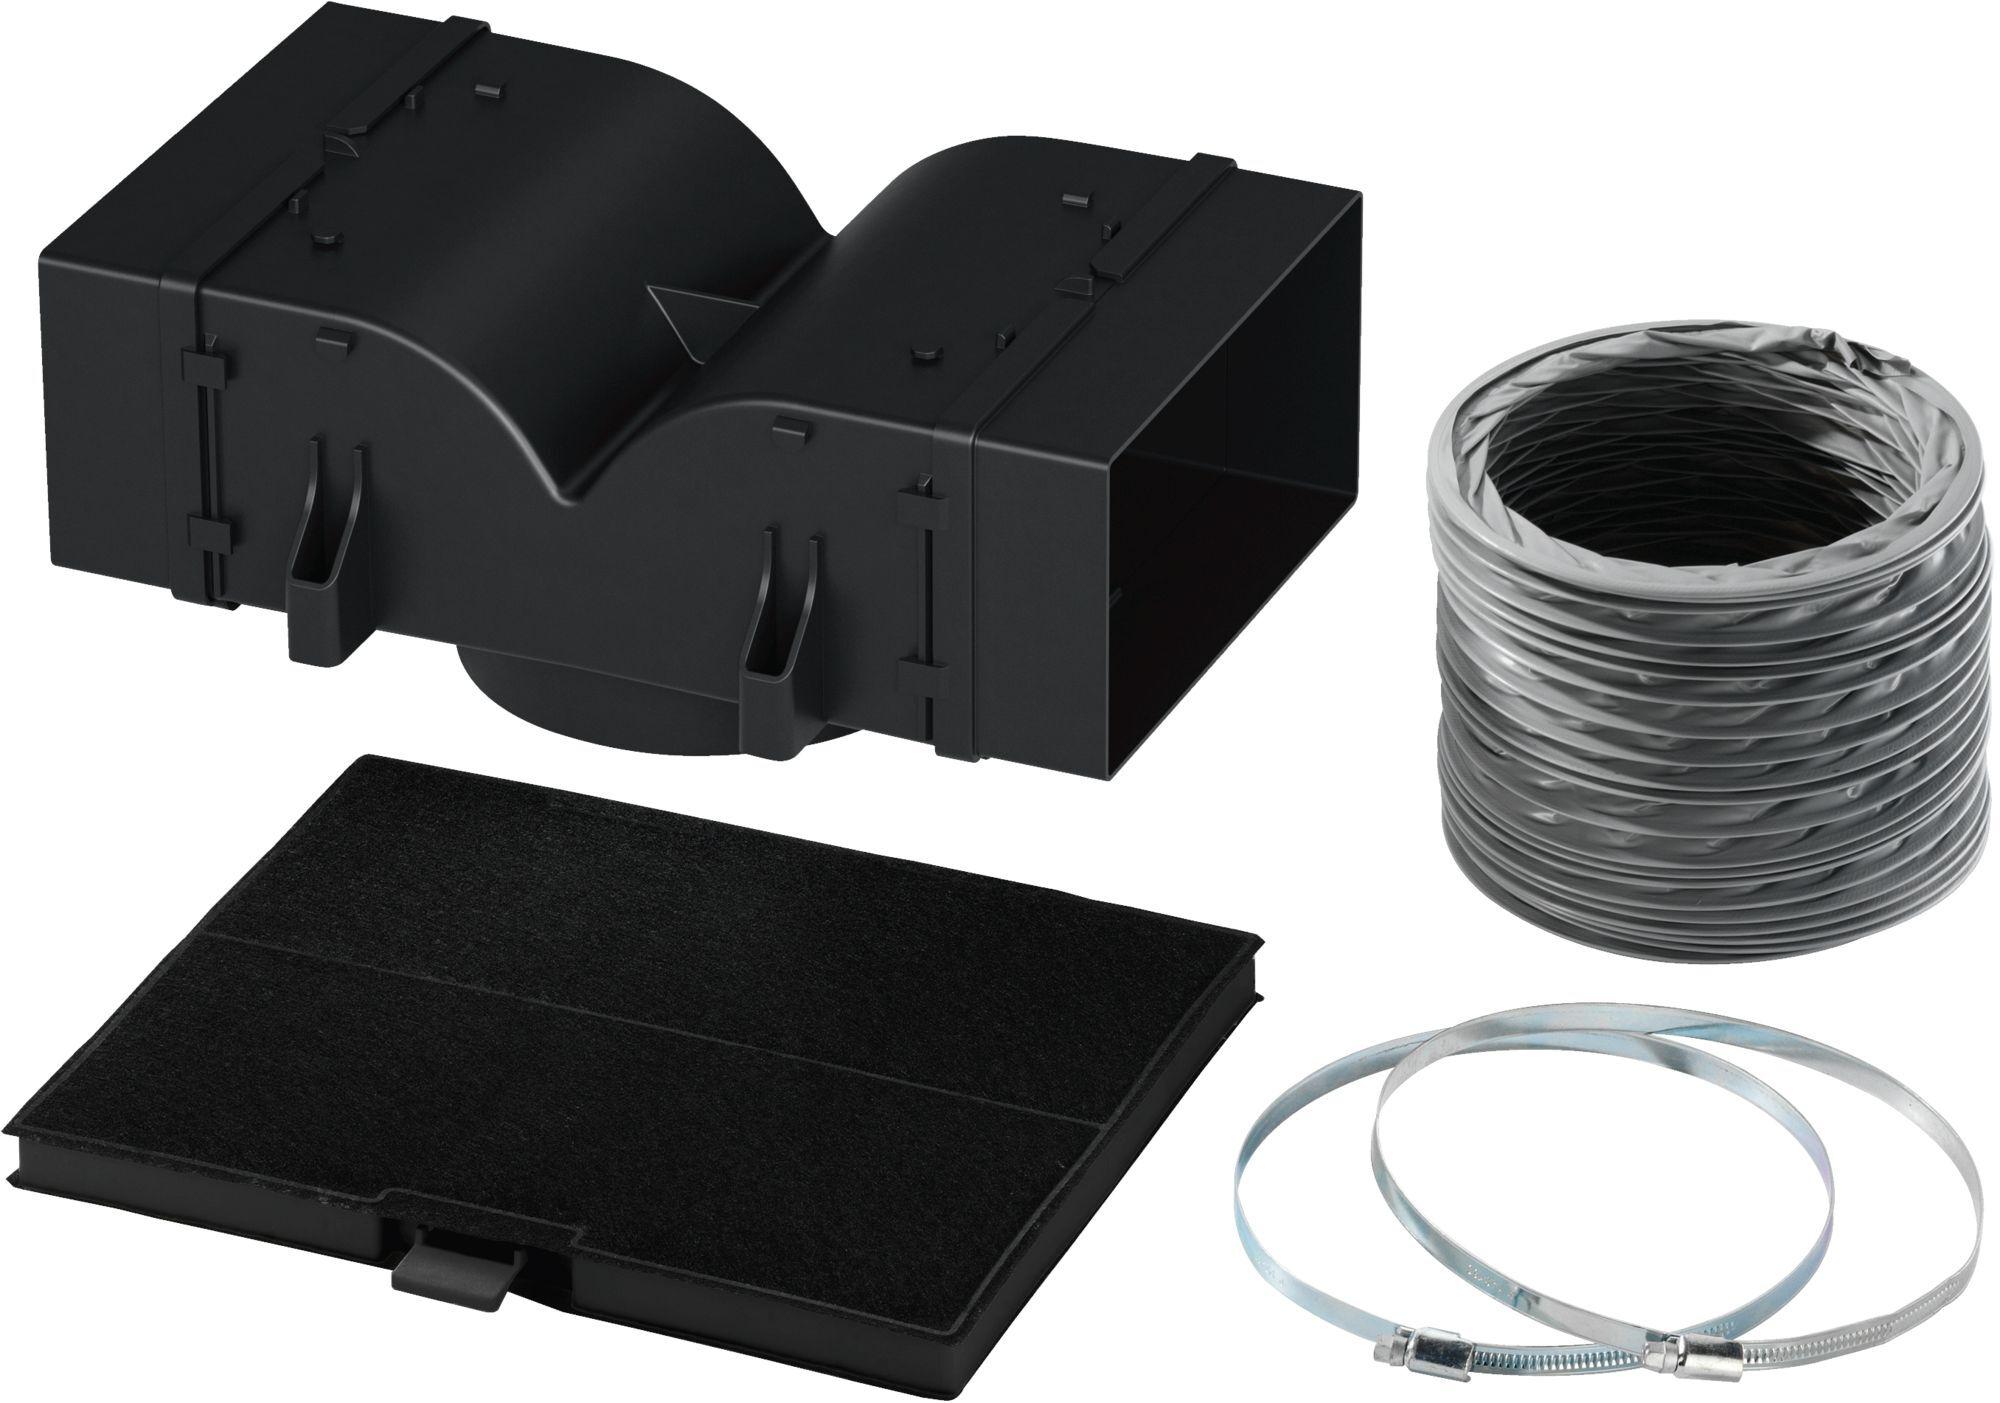 Siemens LZ53850 Recirculating Kit